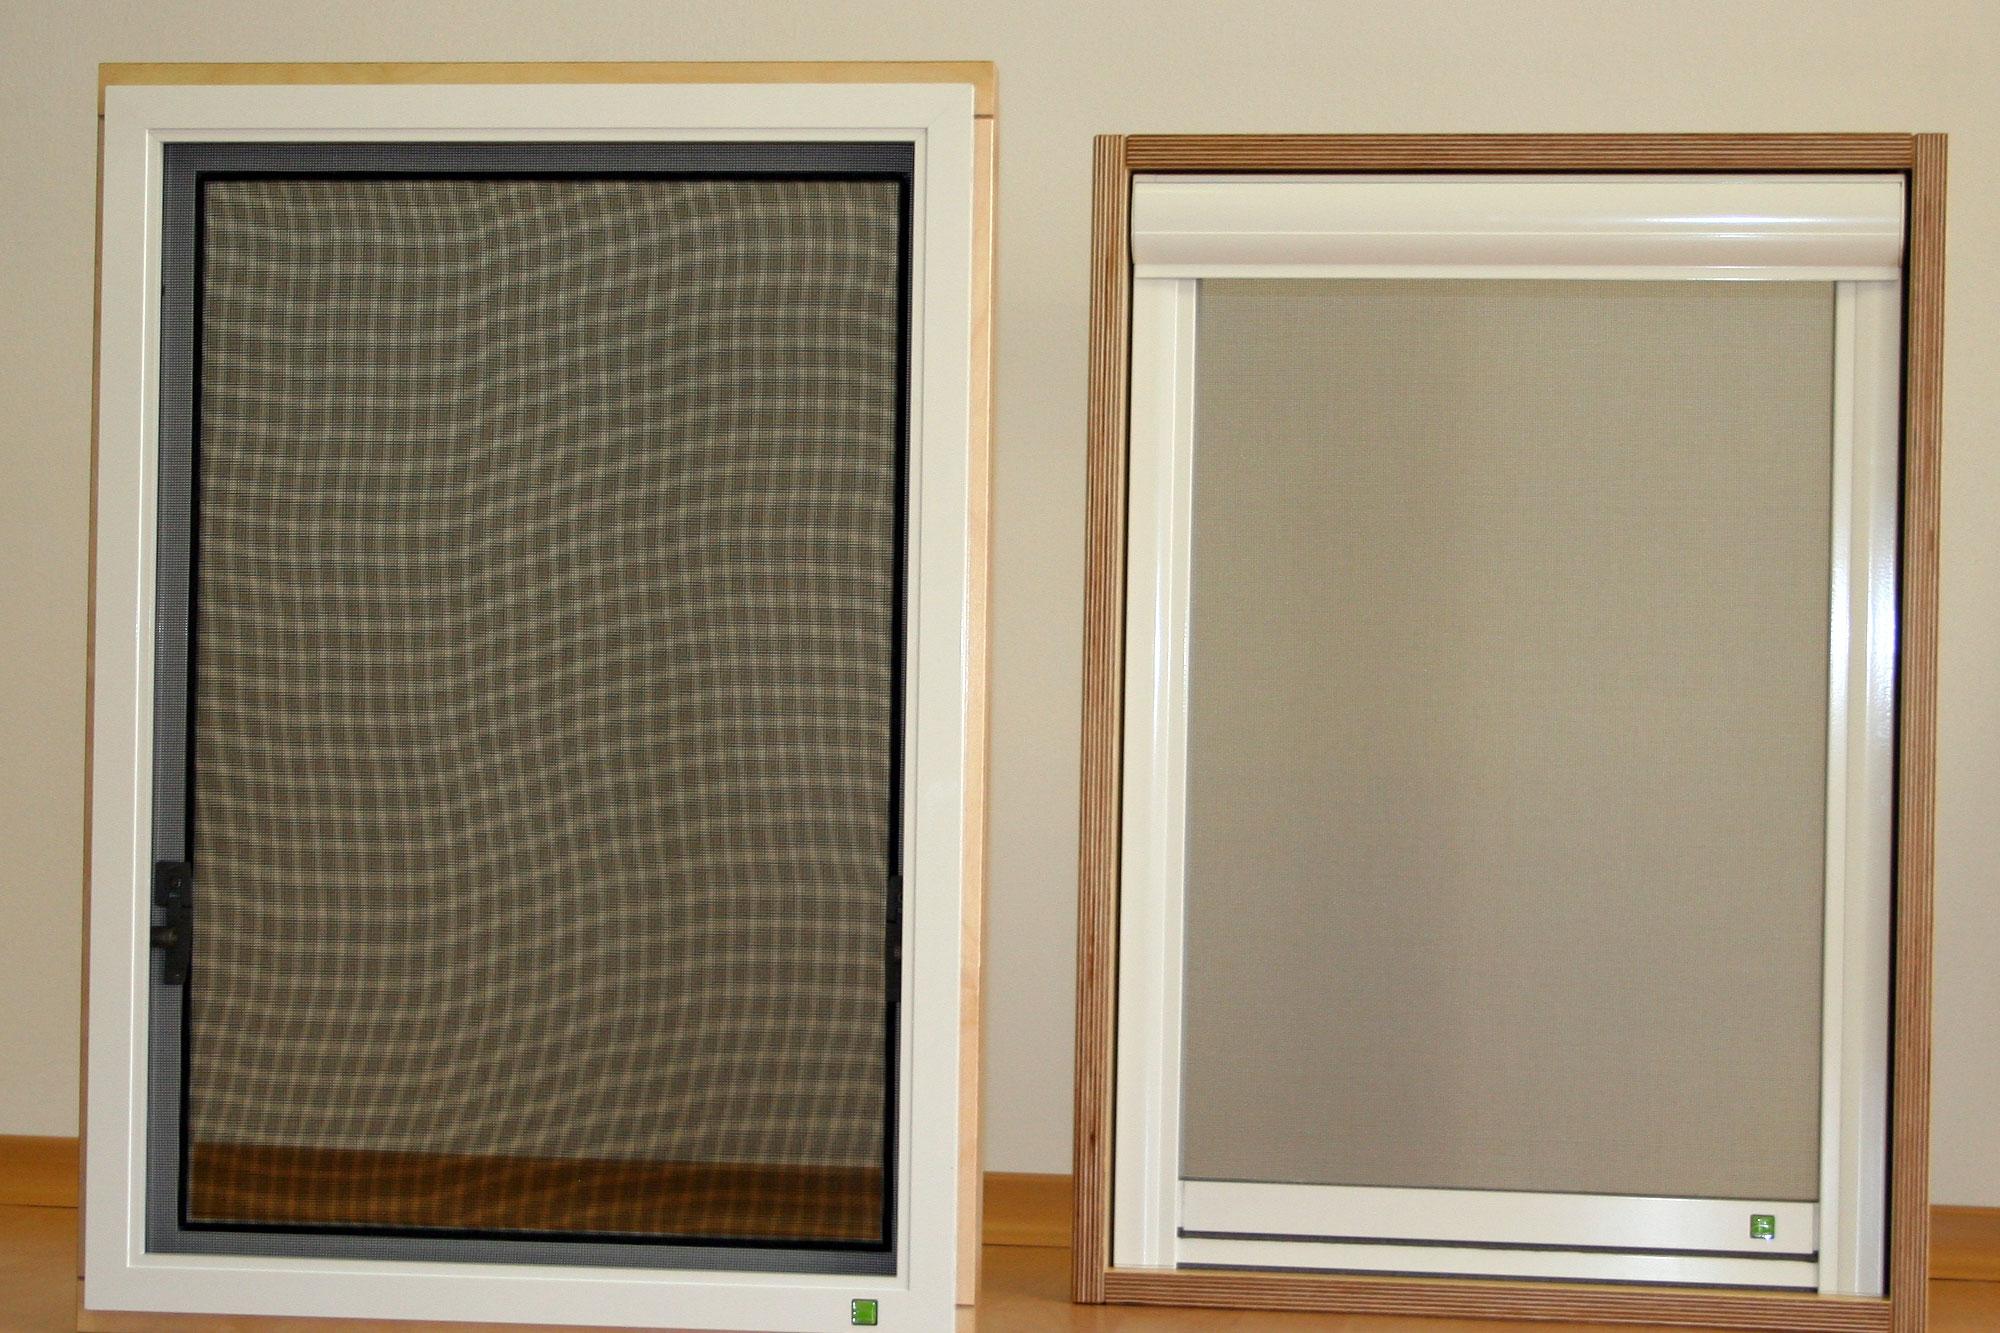 insektenschutz hohmann sonnenschutz. Black Bedroom Furniture Sets. Home Design Ideas